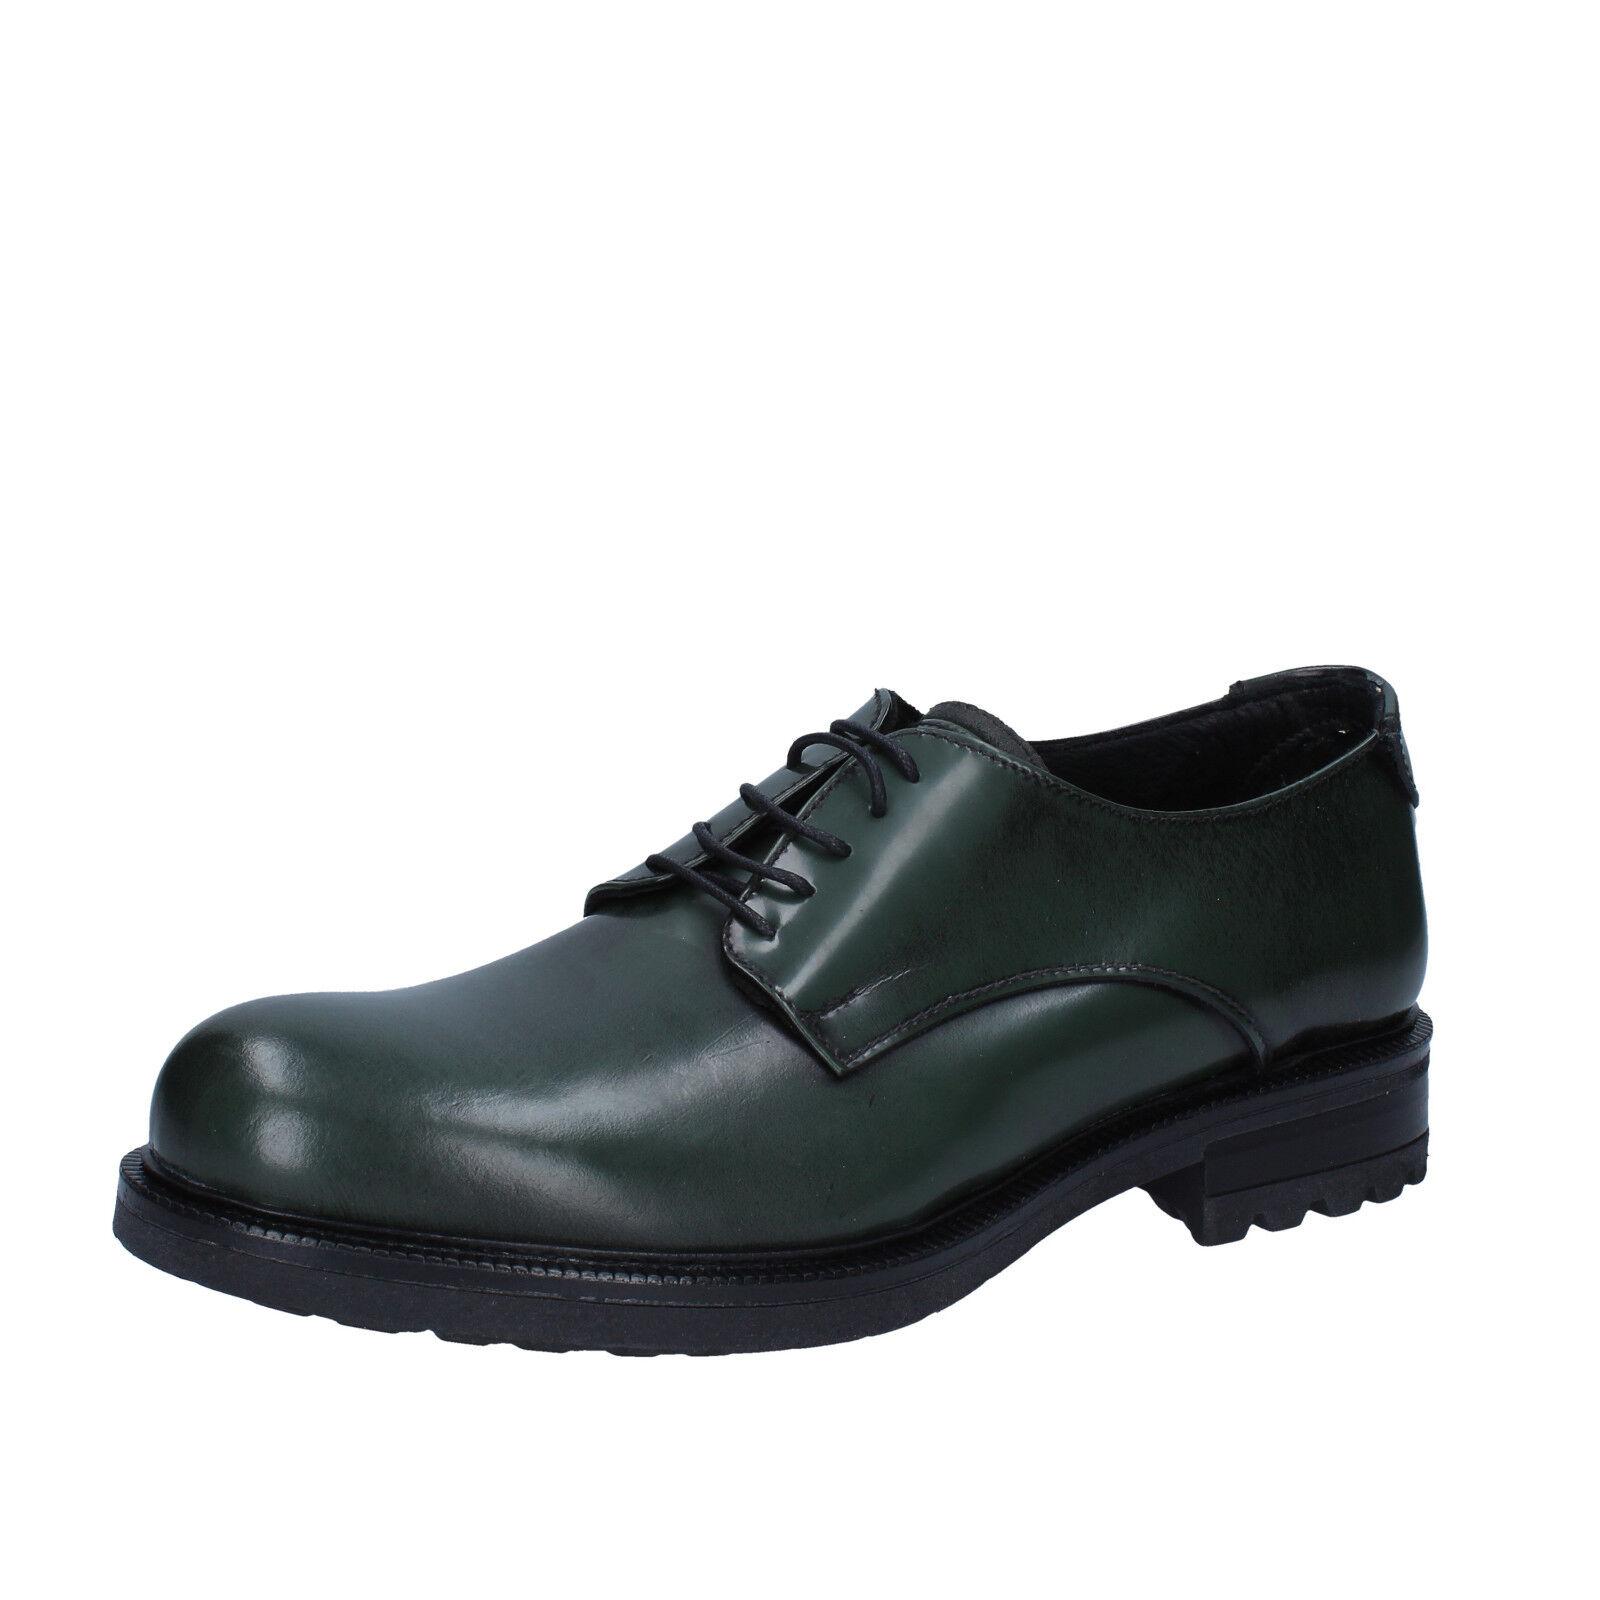 Mens shoes SALVO BARONE 11 (EU 45) elegant green leather  BZ158-45